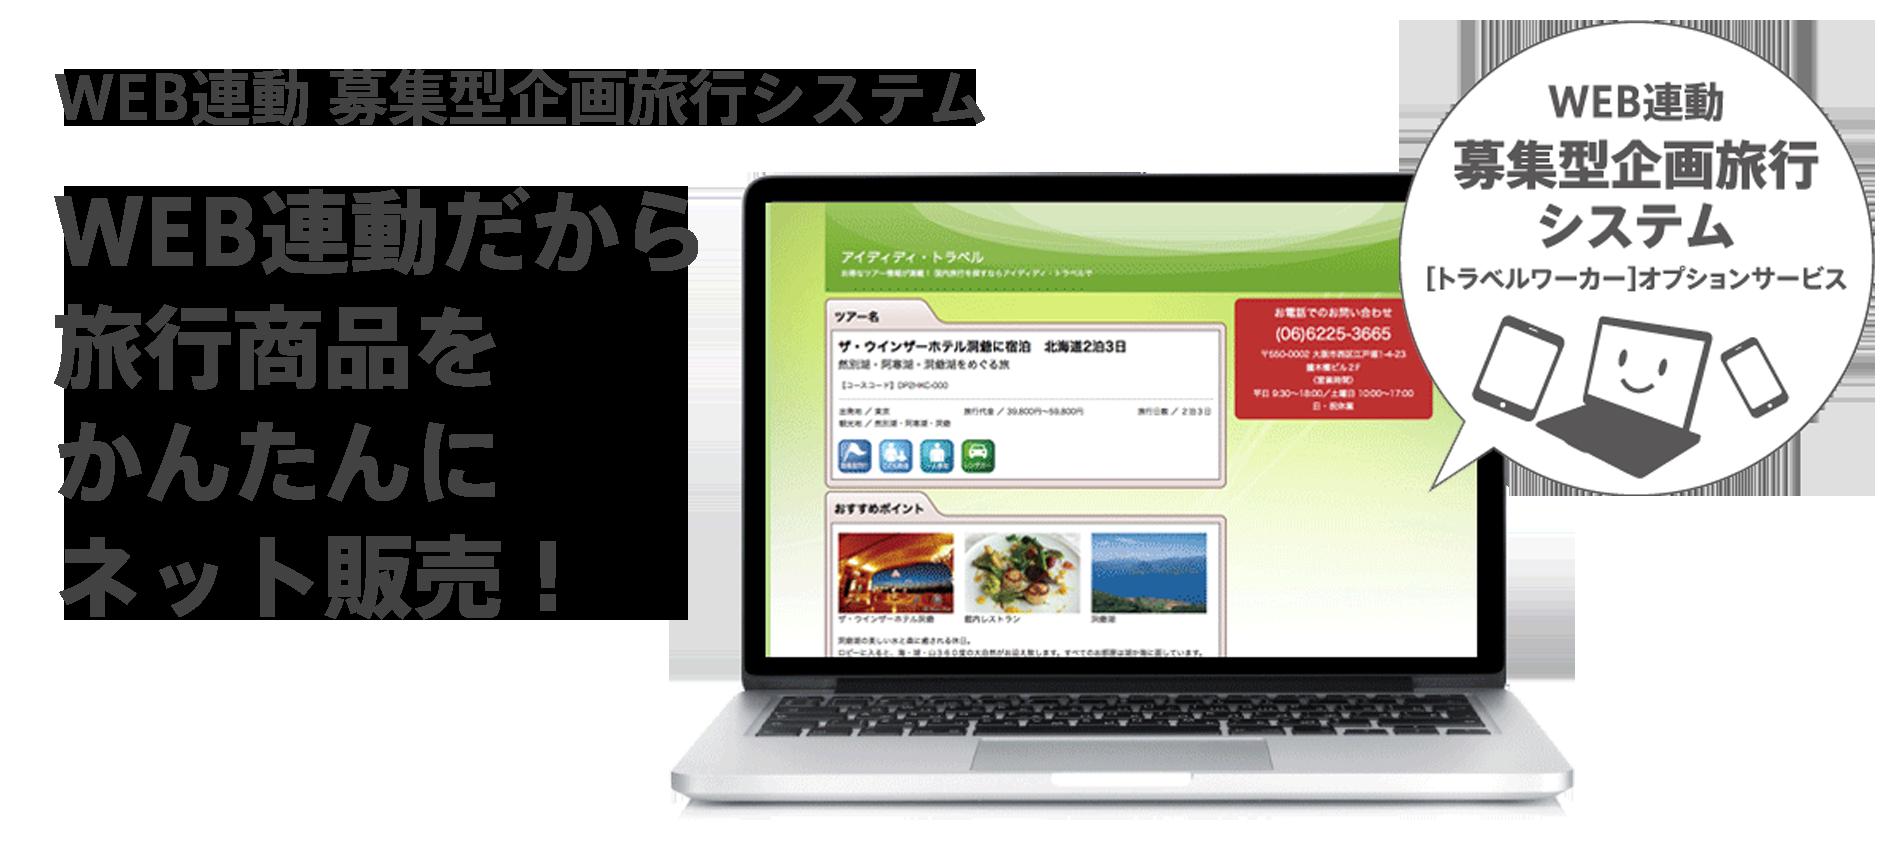 Web連動 募集型企画旅行システム